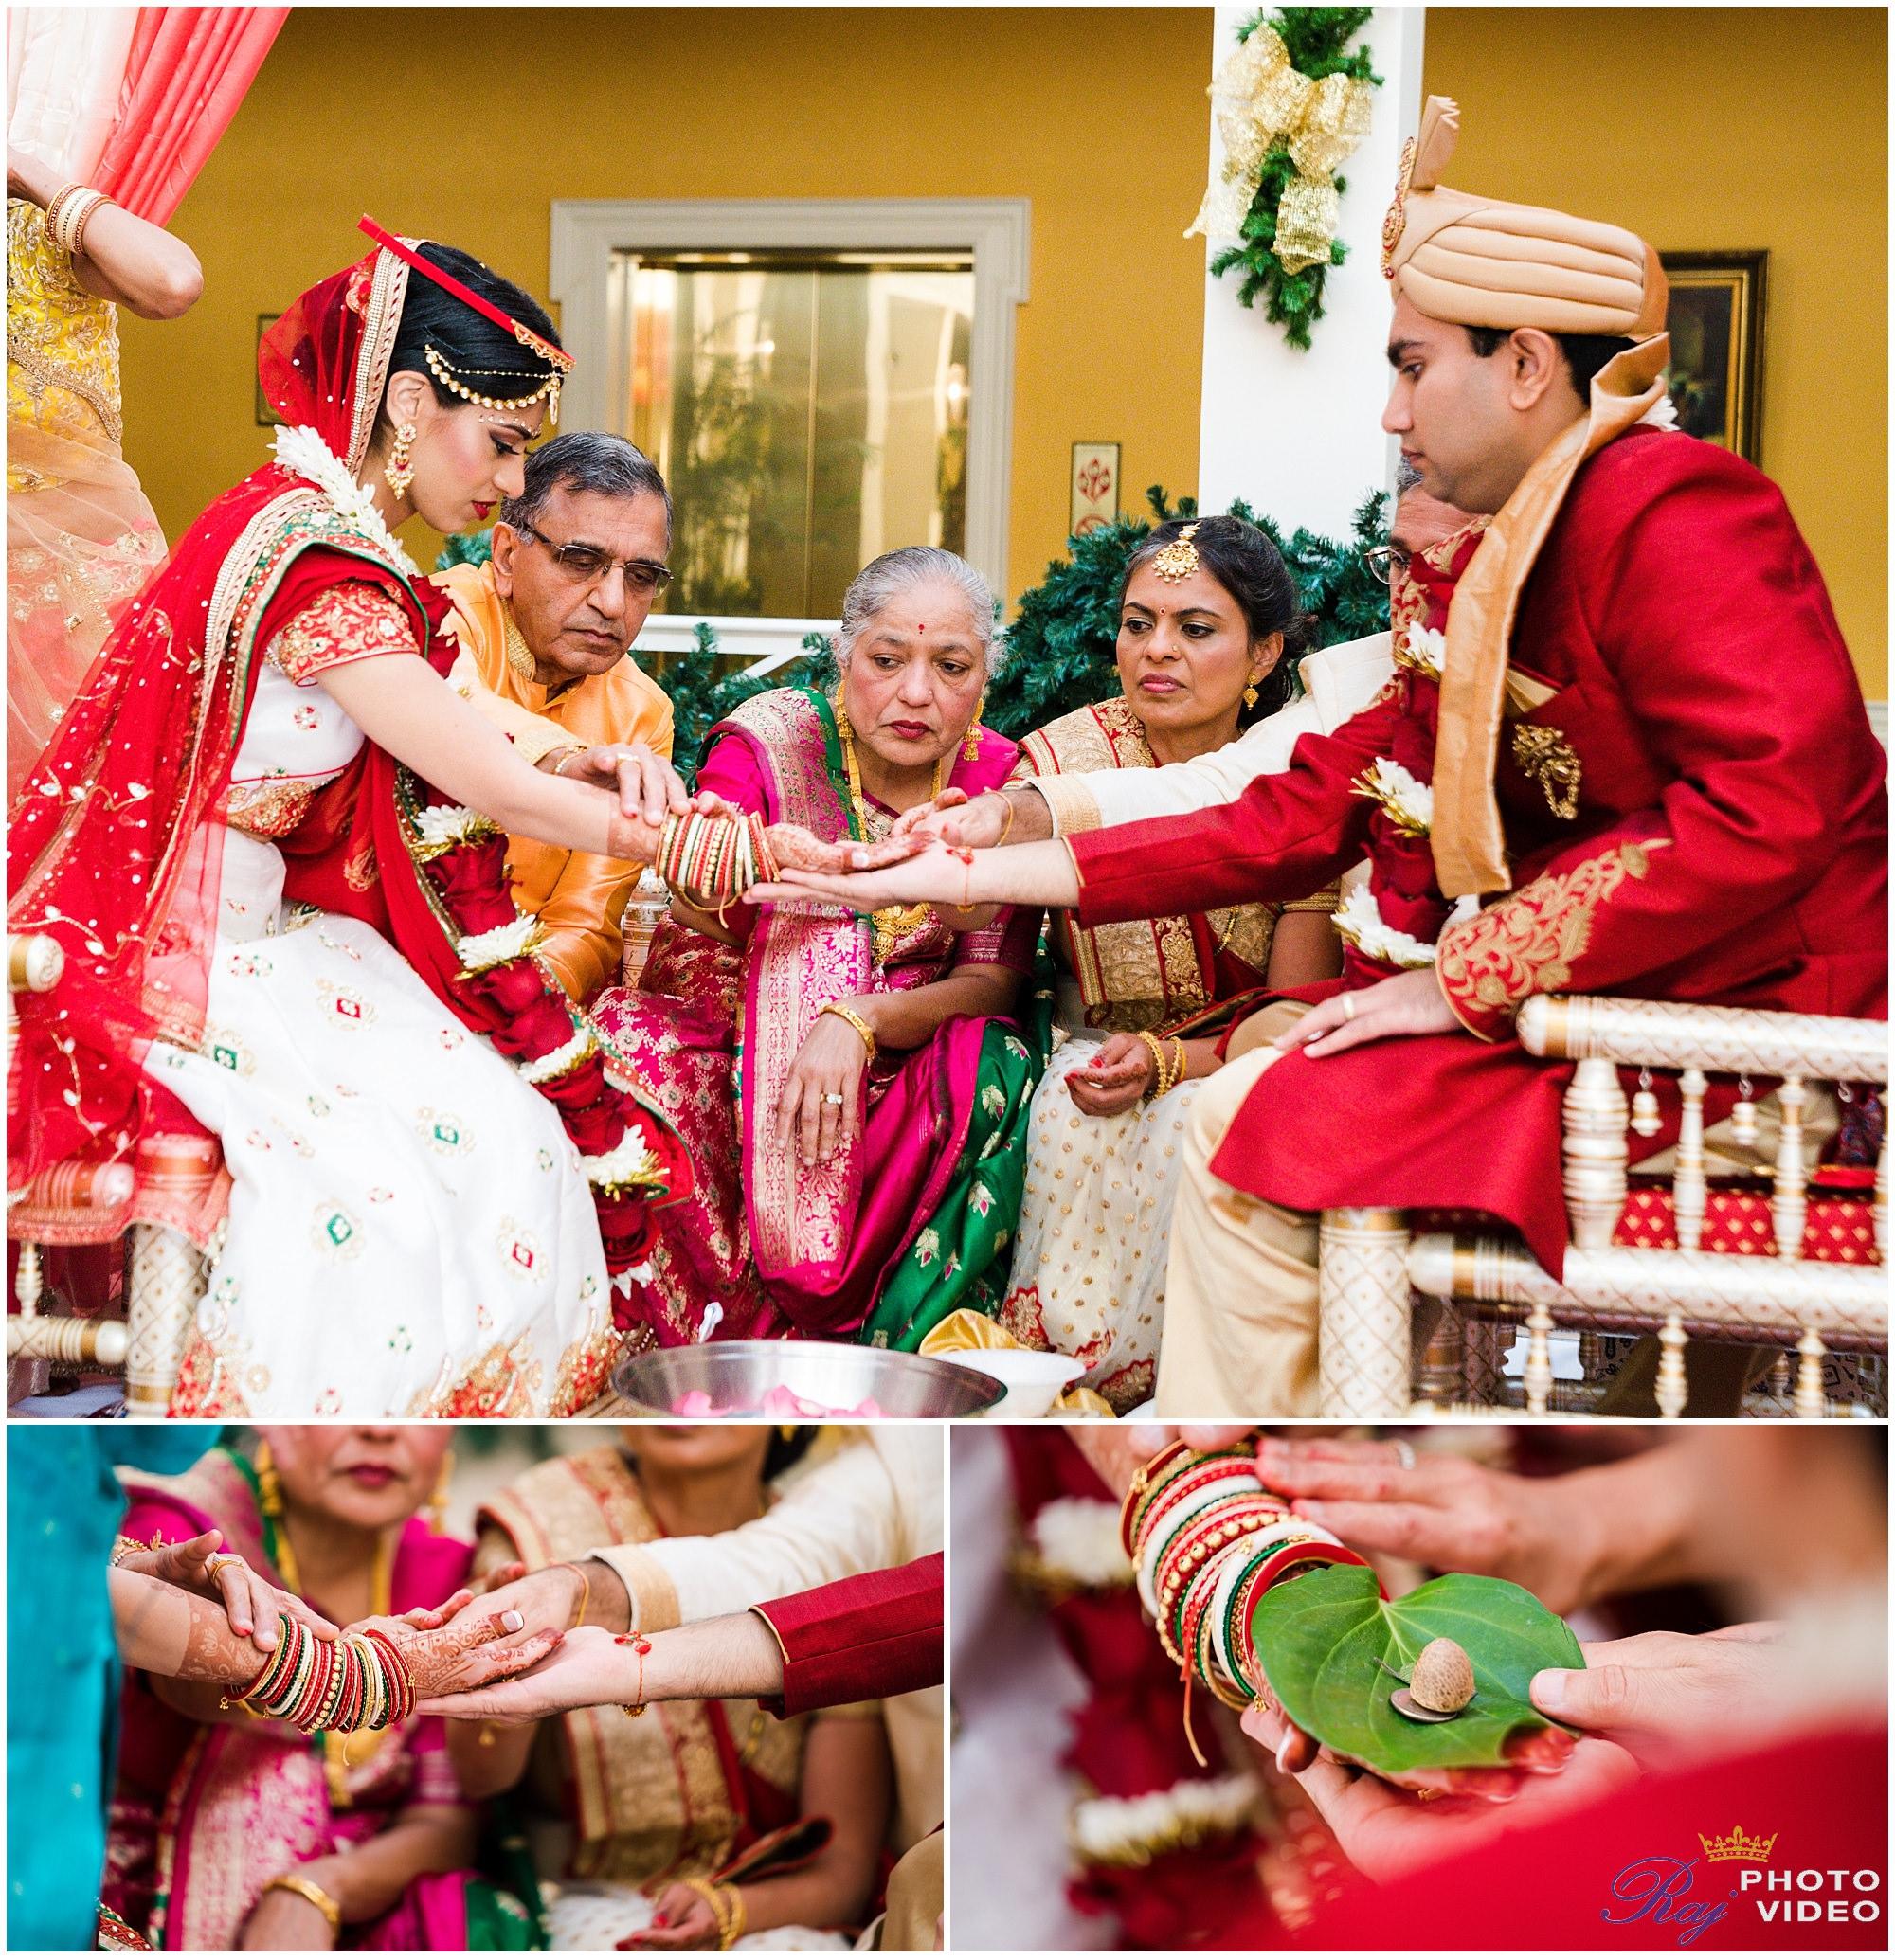 Founders-Inn-and-Spa-Virginia-Beach-VA-Indian-Wedding-Harini-Vivek-37.jpg